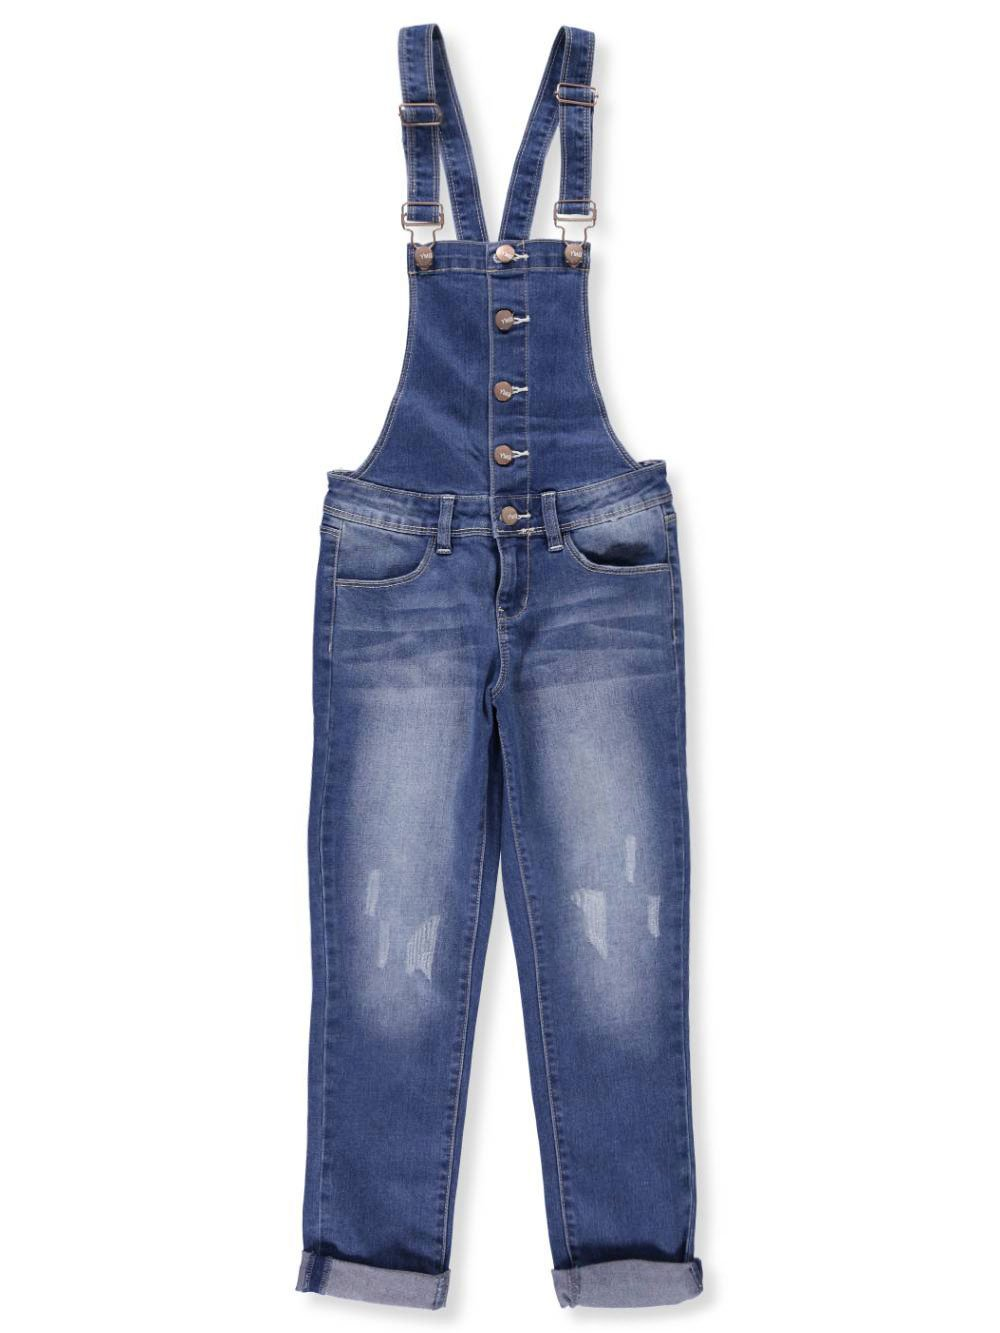 YMI Big Girls' Overalls - Denim Blue, 12